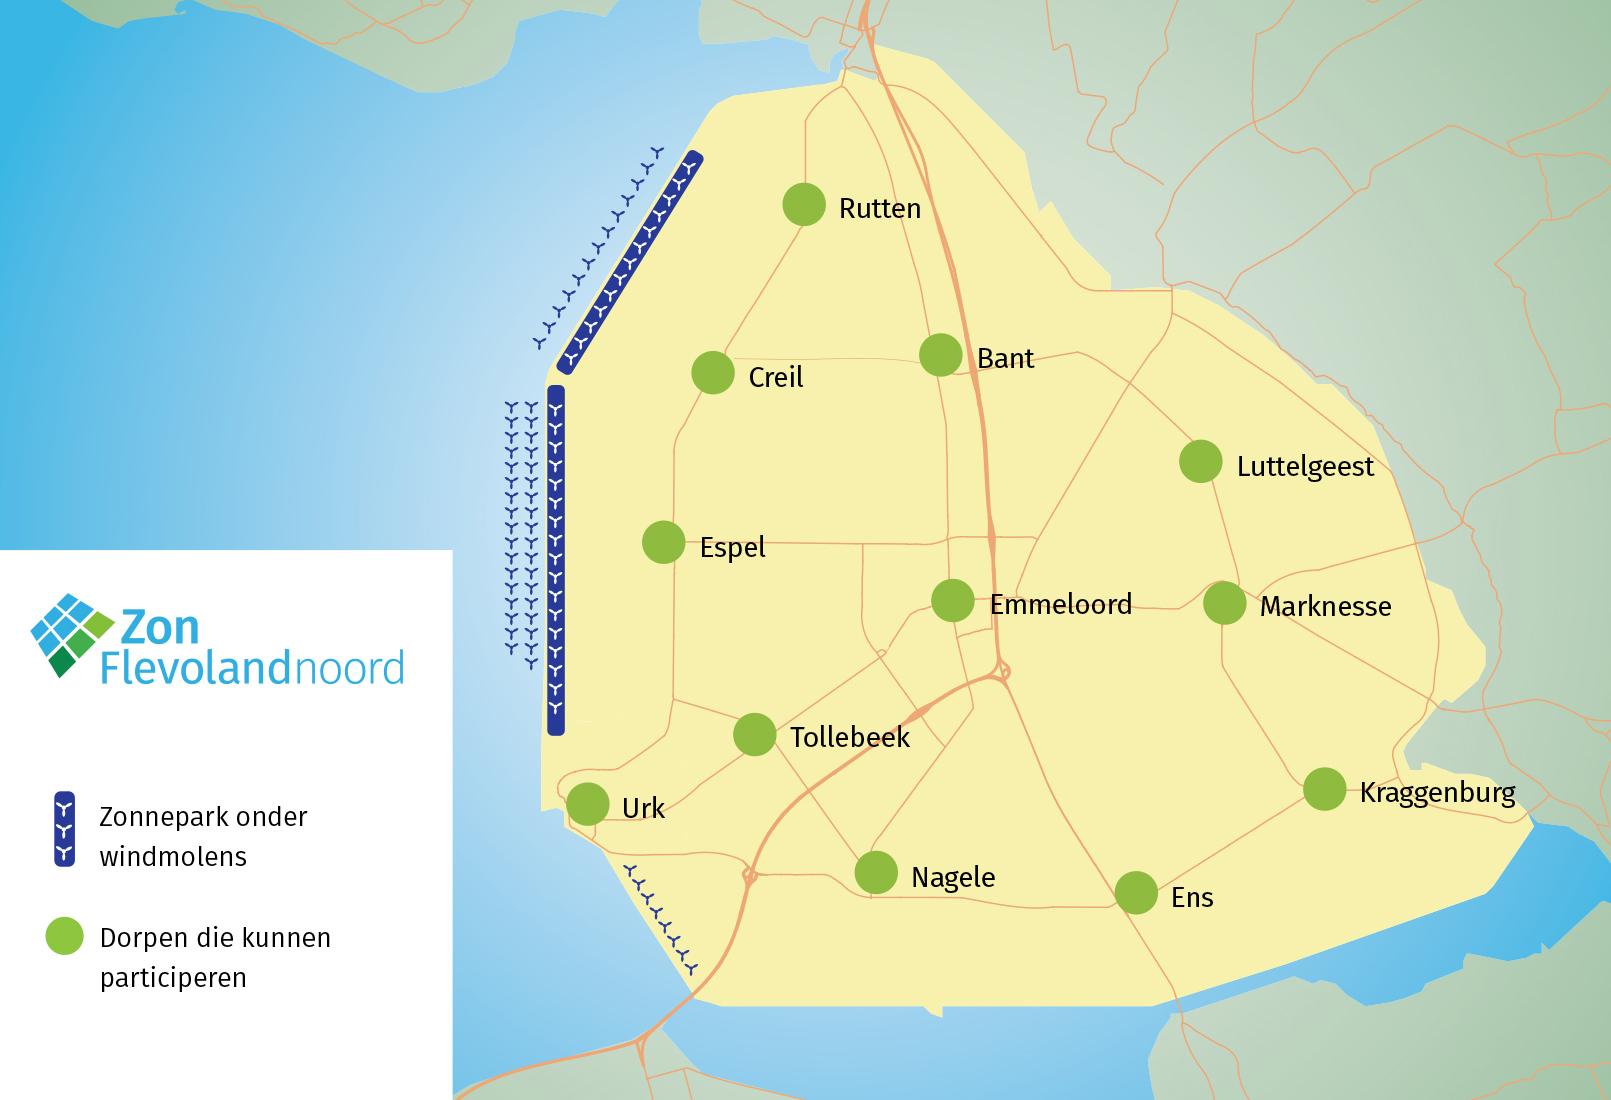 Flevoland Noord zonnepanelen